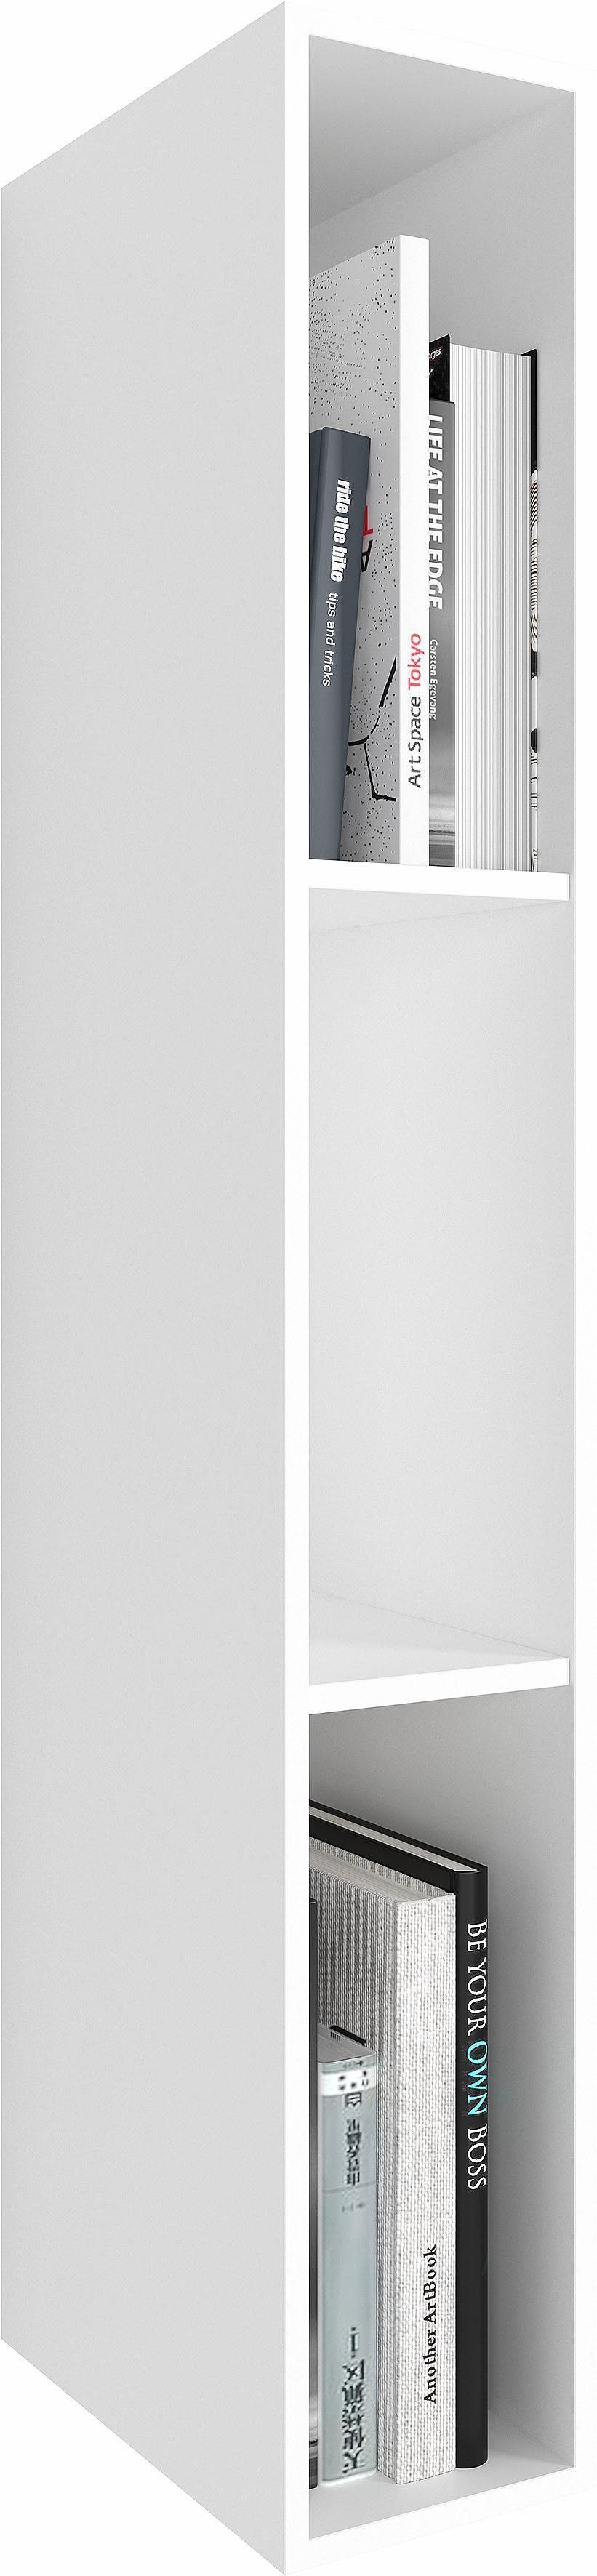 NETFURN BY GWINNER Regal »ANZIO«, Lack weiß, Höhe 108 cm